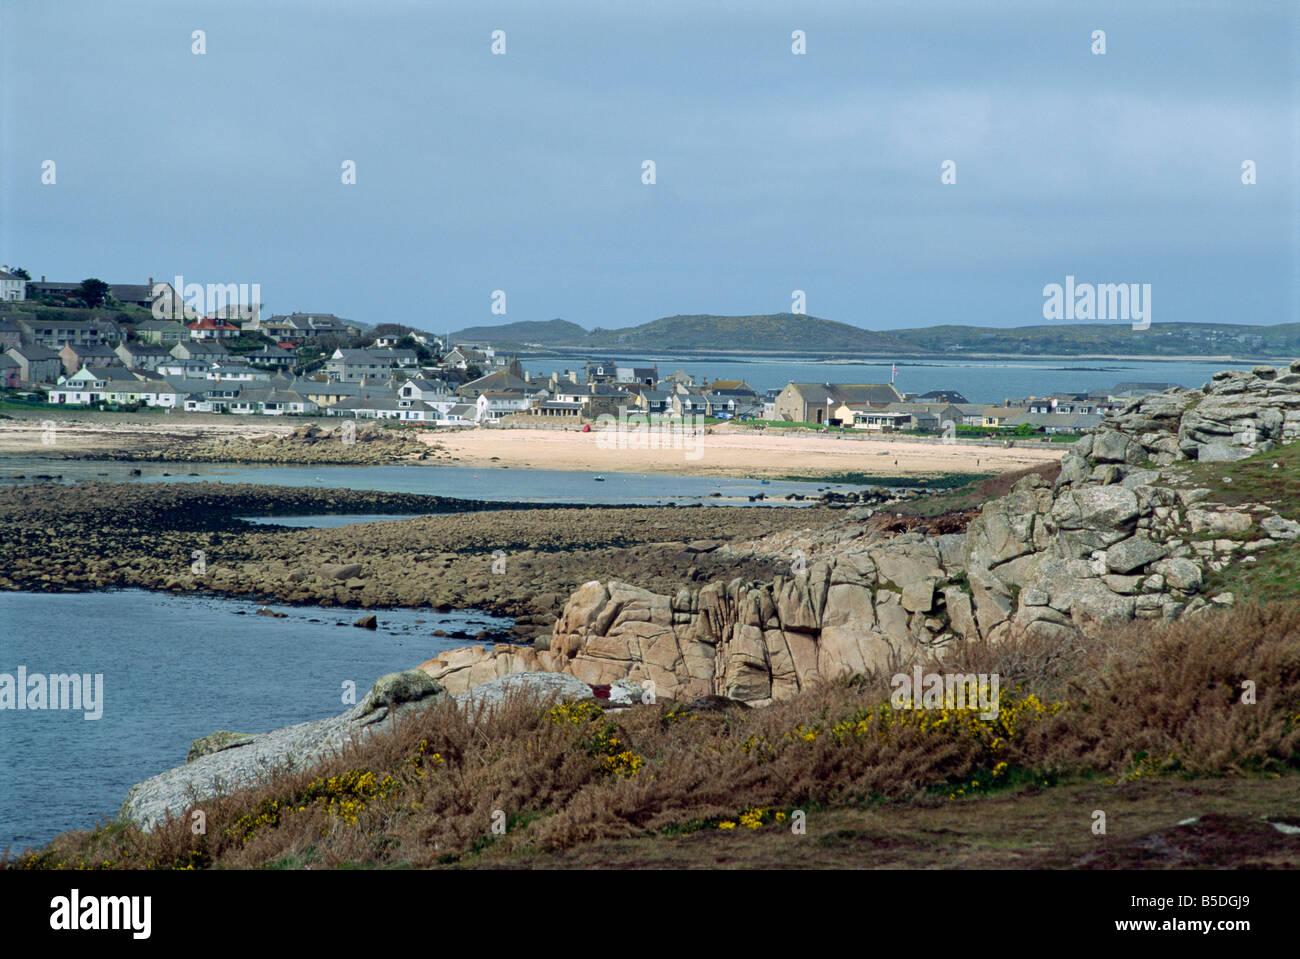 Porthcressa Beach Hugh Town St Mary s Isles of Scilly United Kingdom Europe - Stock Image